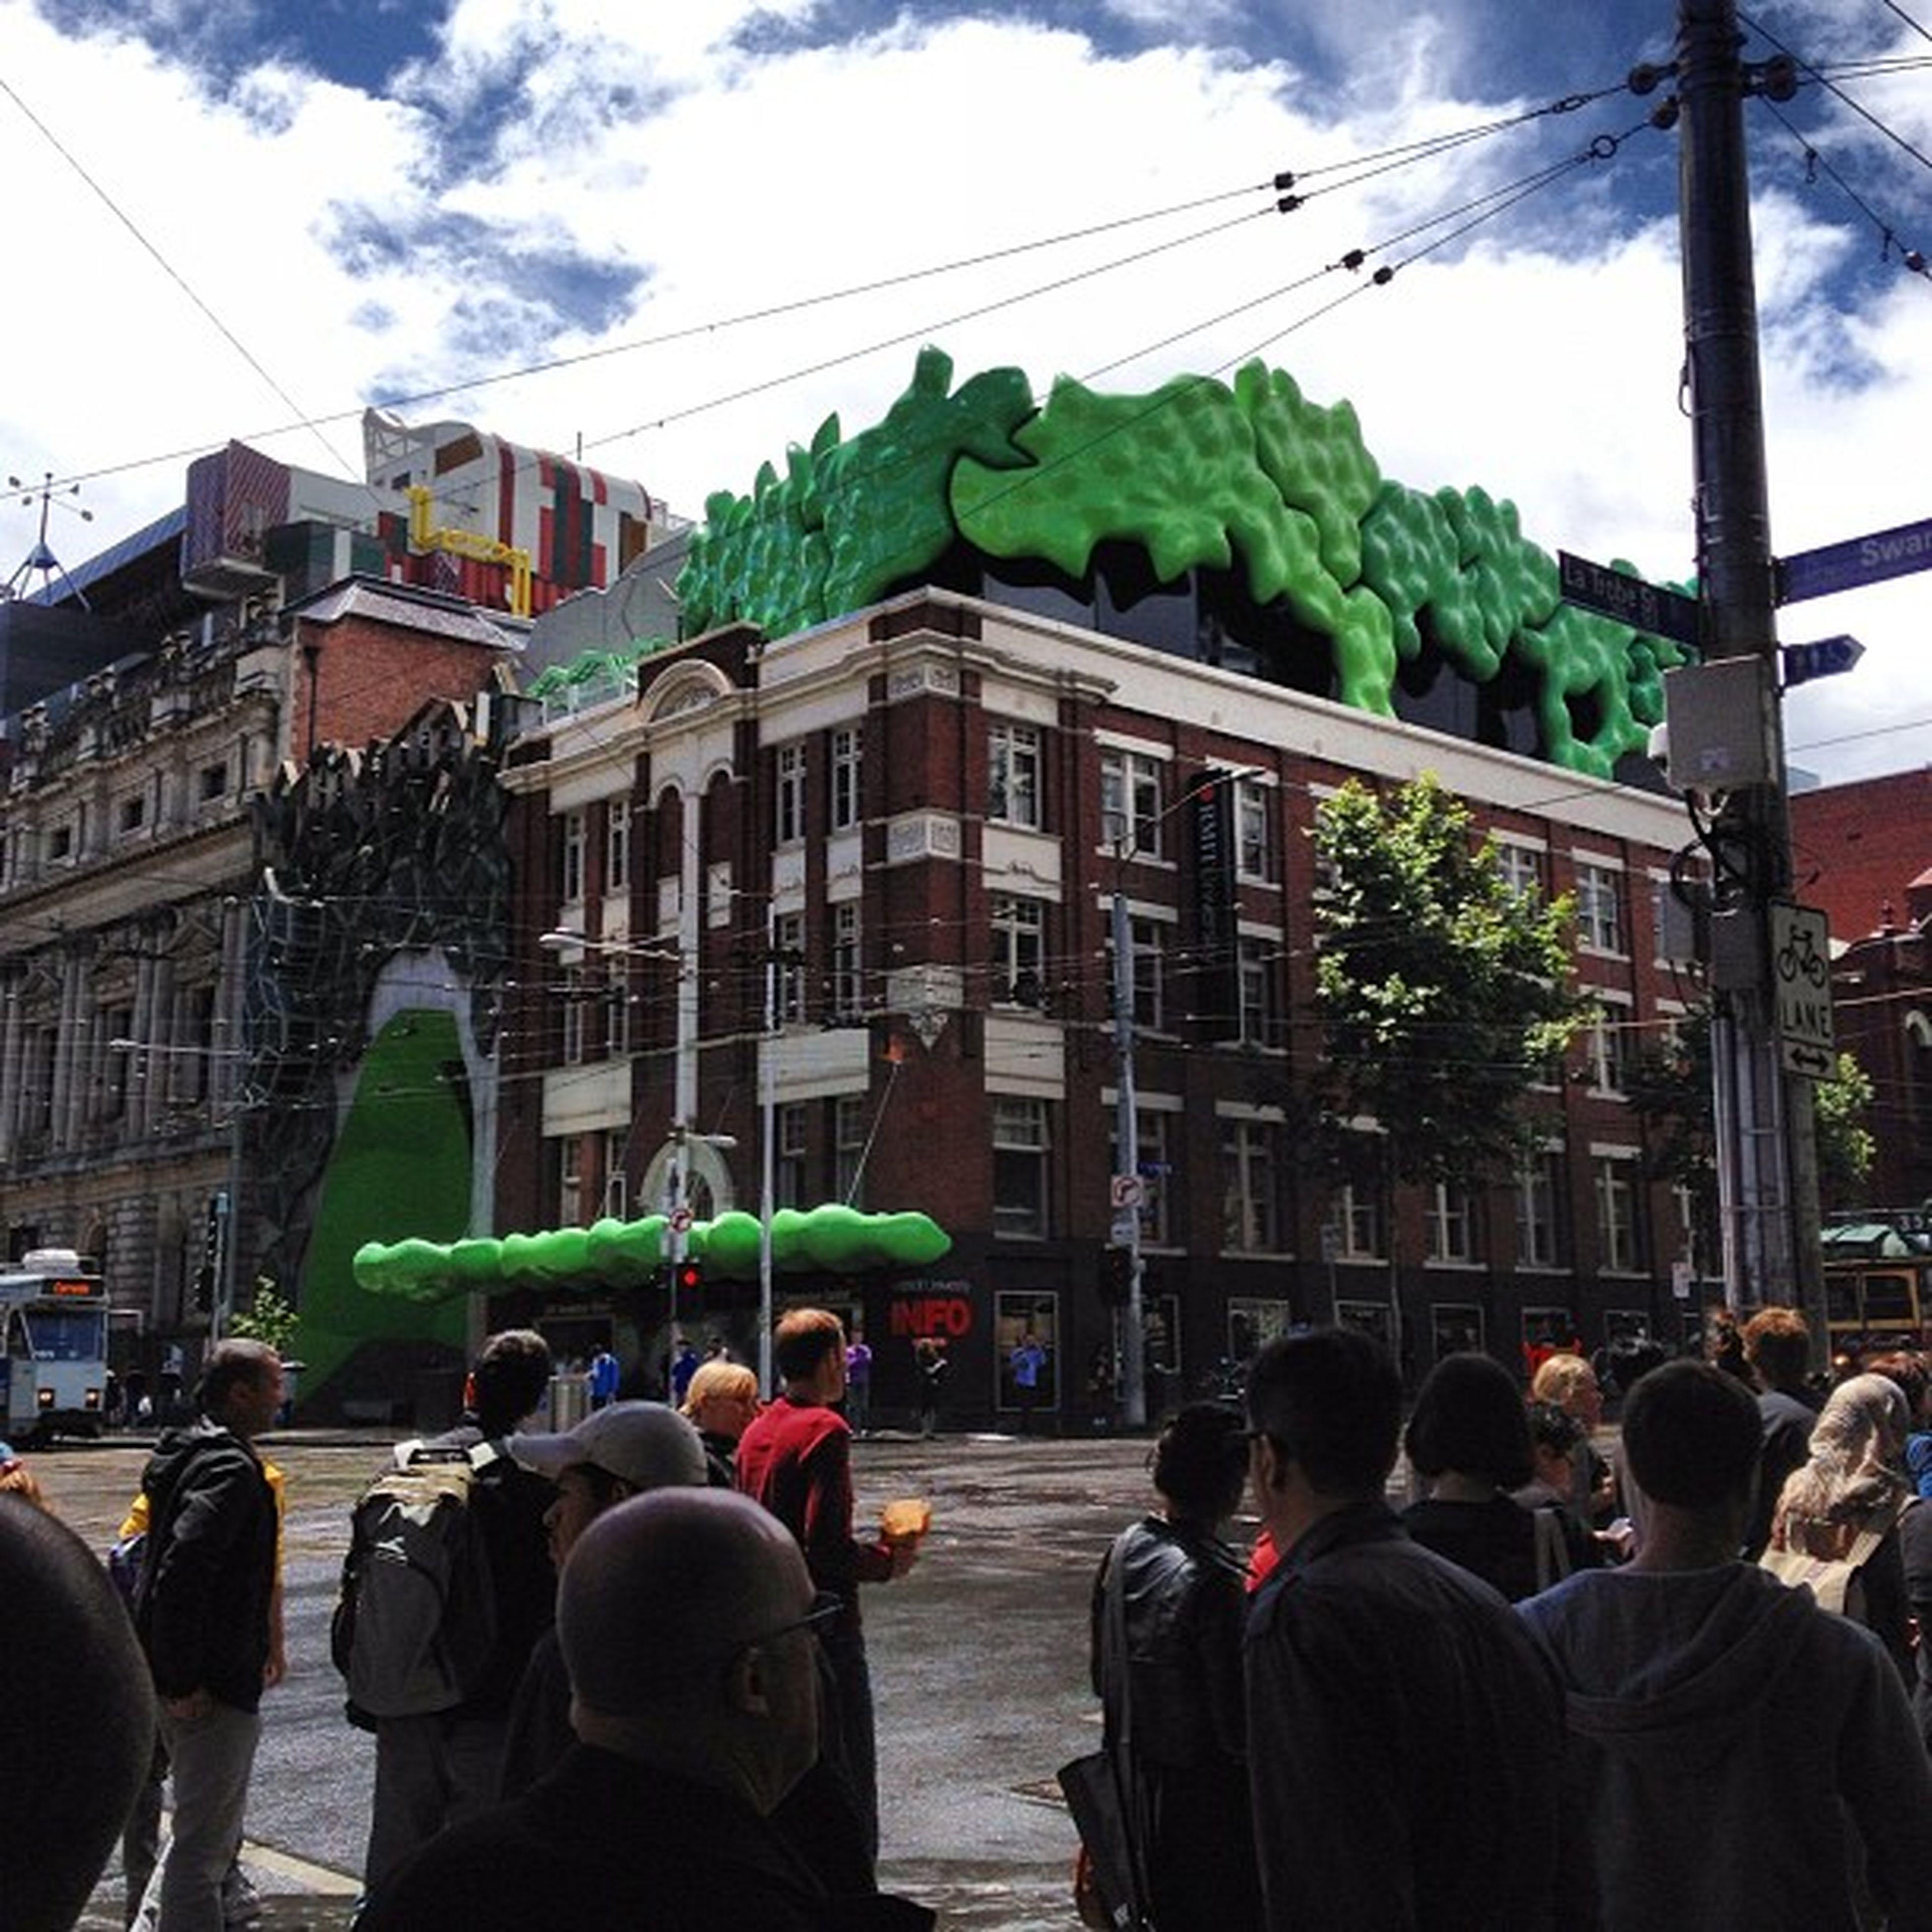 #rmit #university #swanston_st #melbourne Melbourne University Rmit Swanston_st